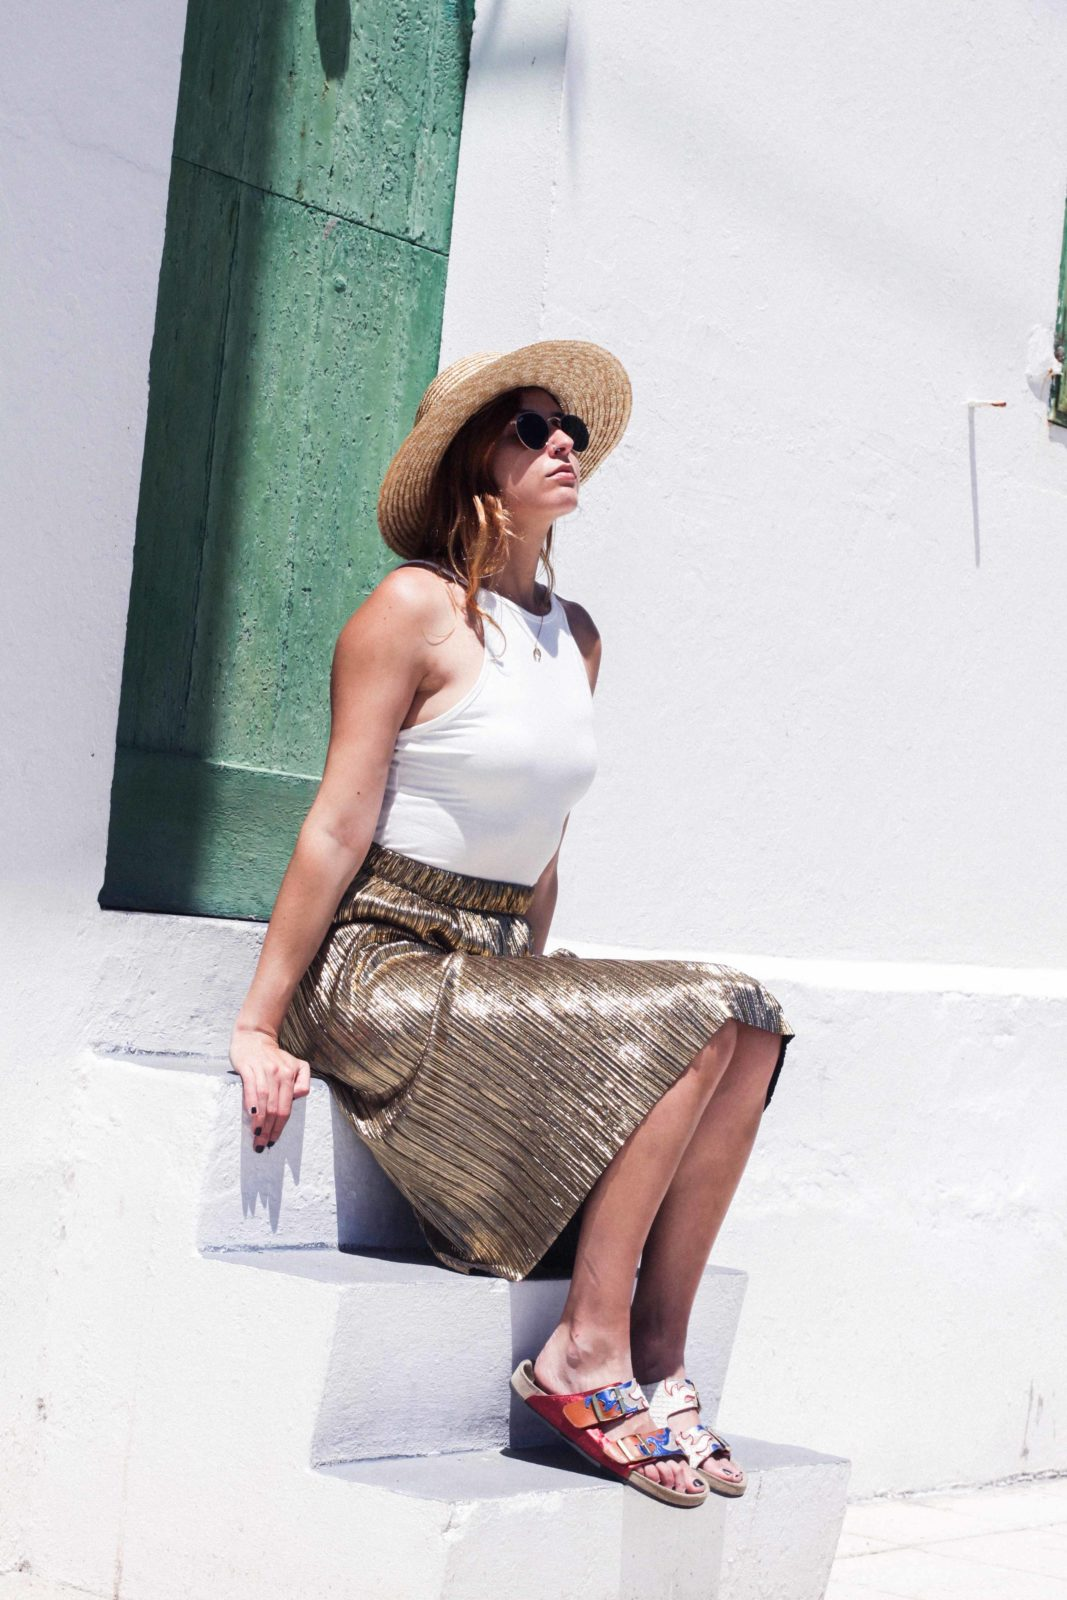 metallics_skirt_falda_dorada_herradura_donkeycool_ardentia_canotier-27